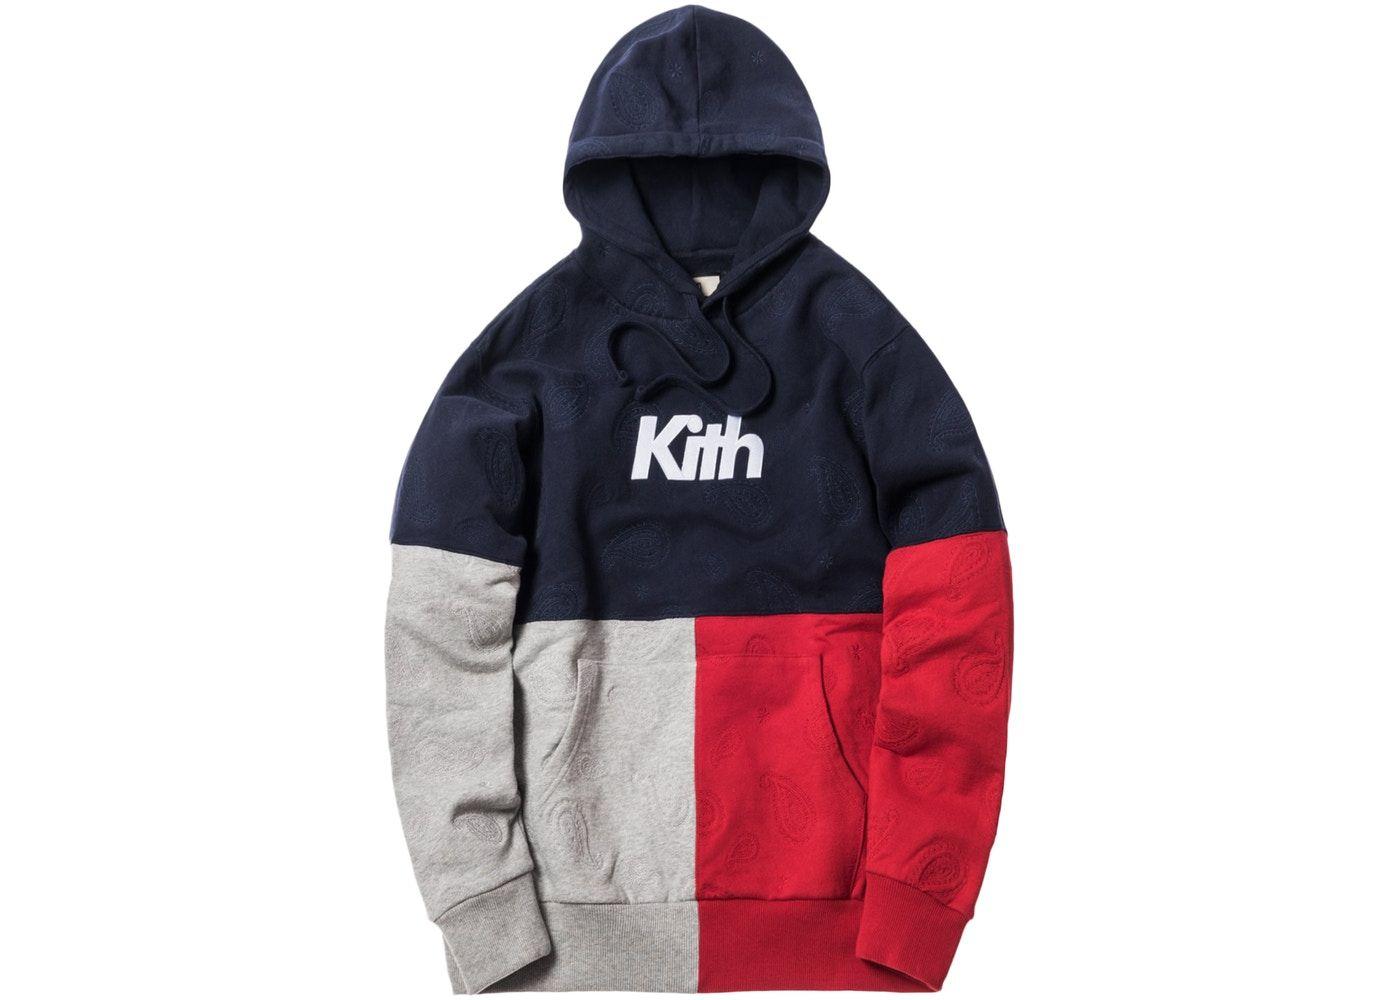 KITH-Streetwear-brand